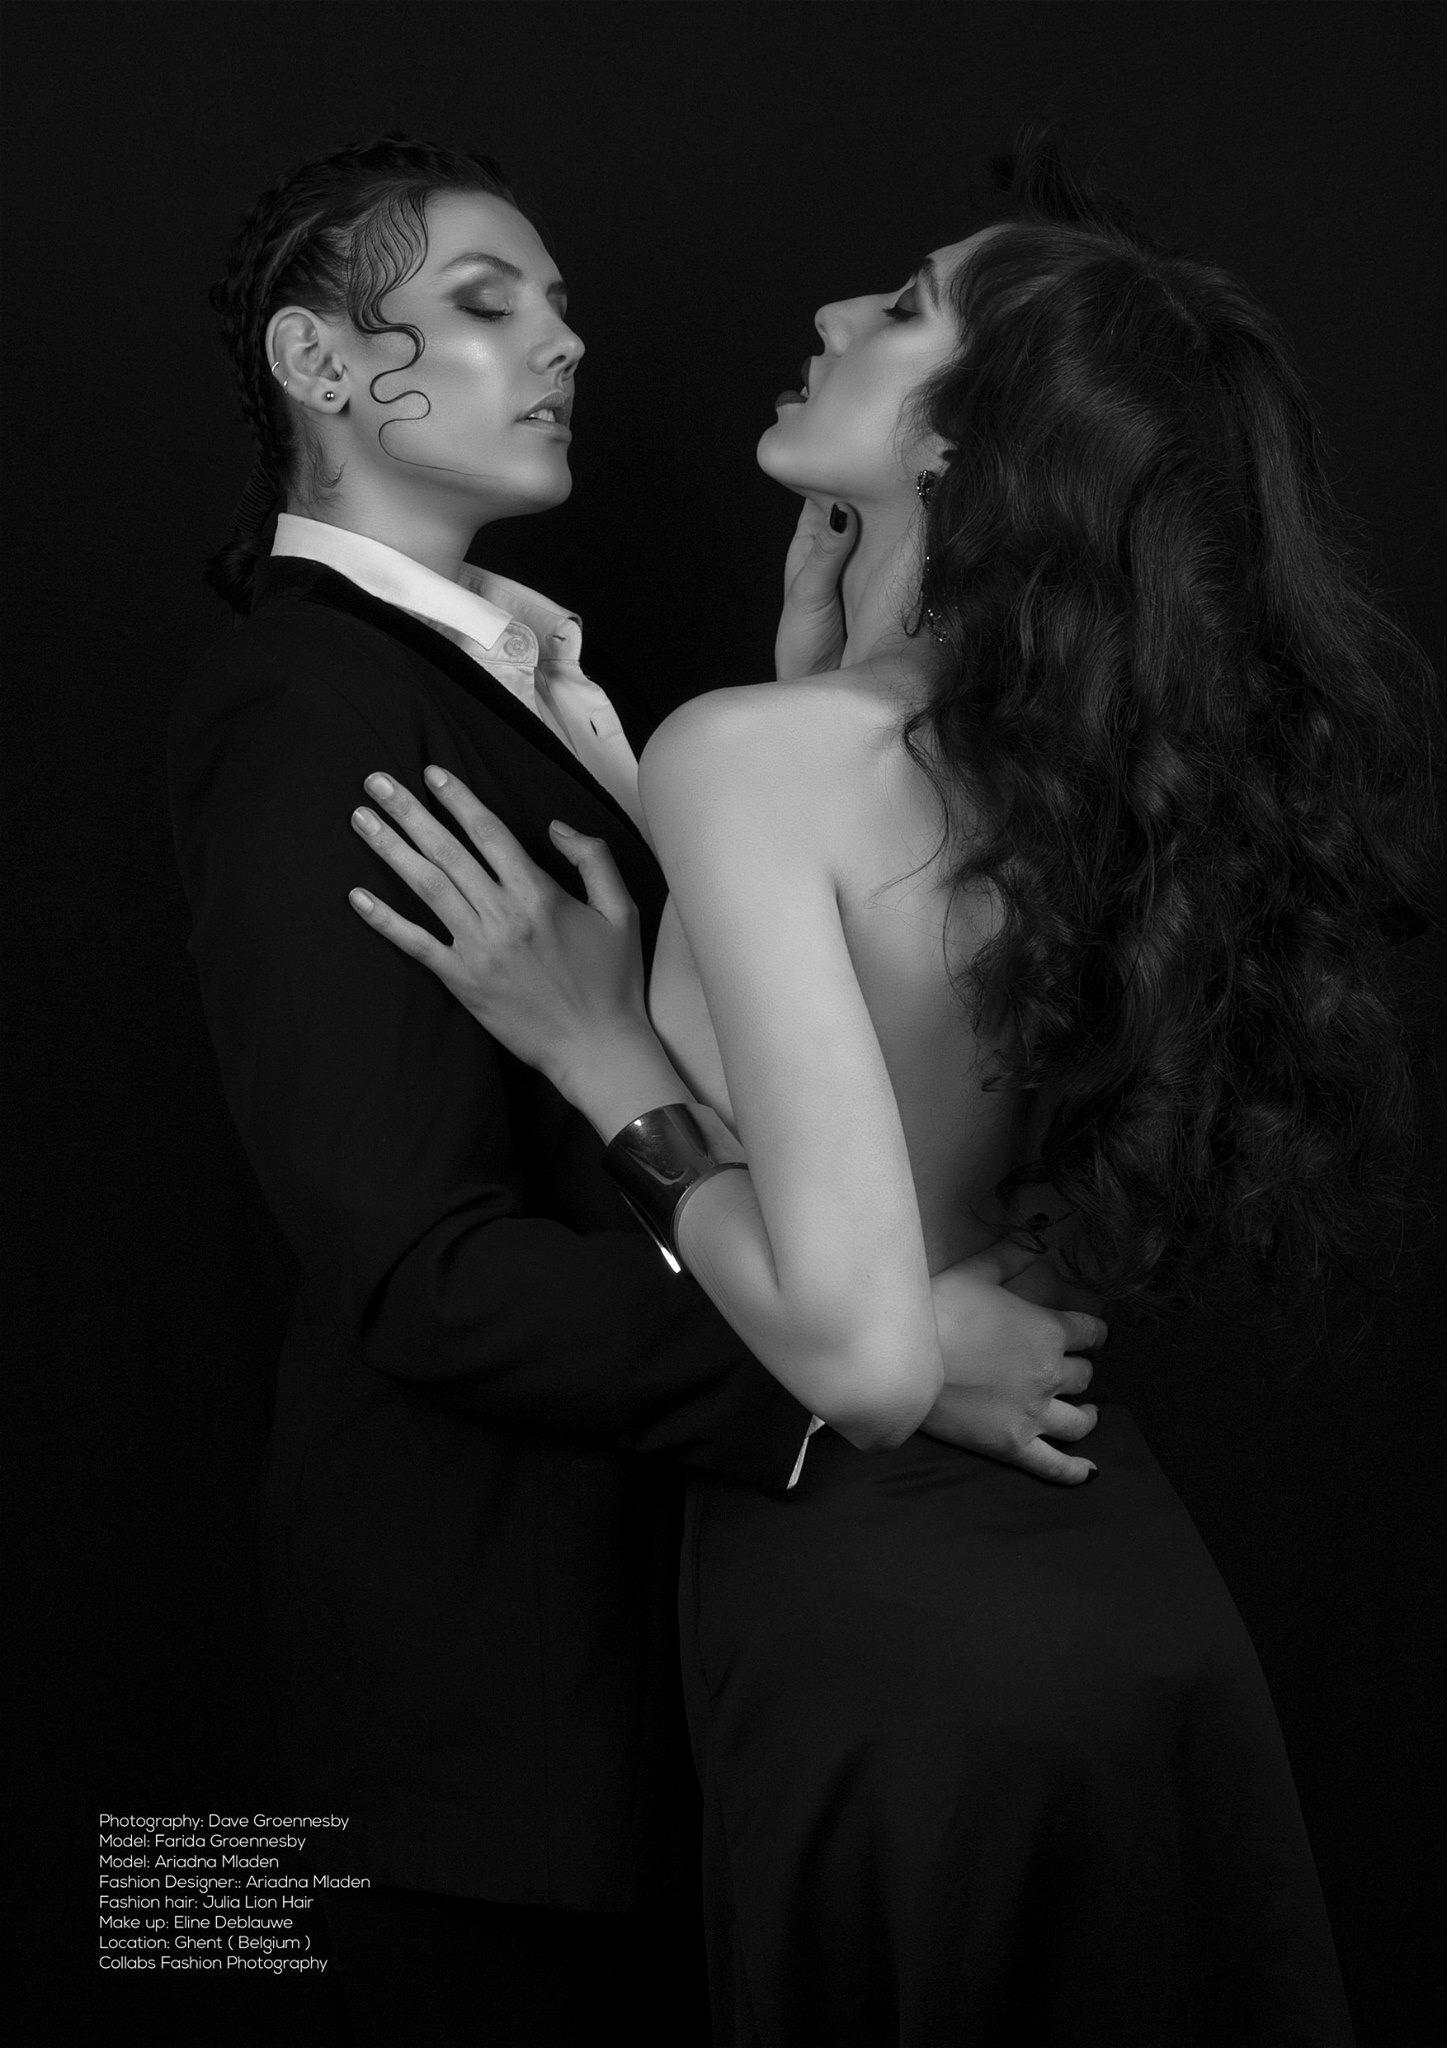 Come closer by Ariadna Mladen